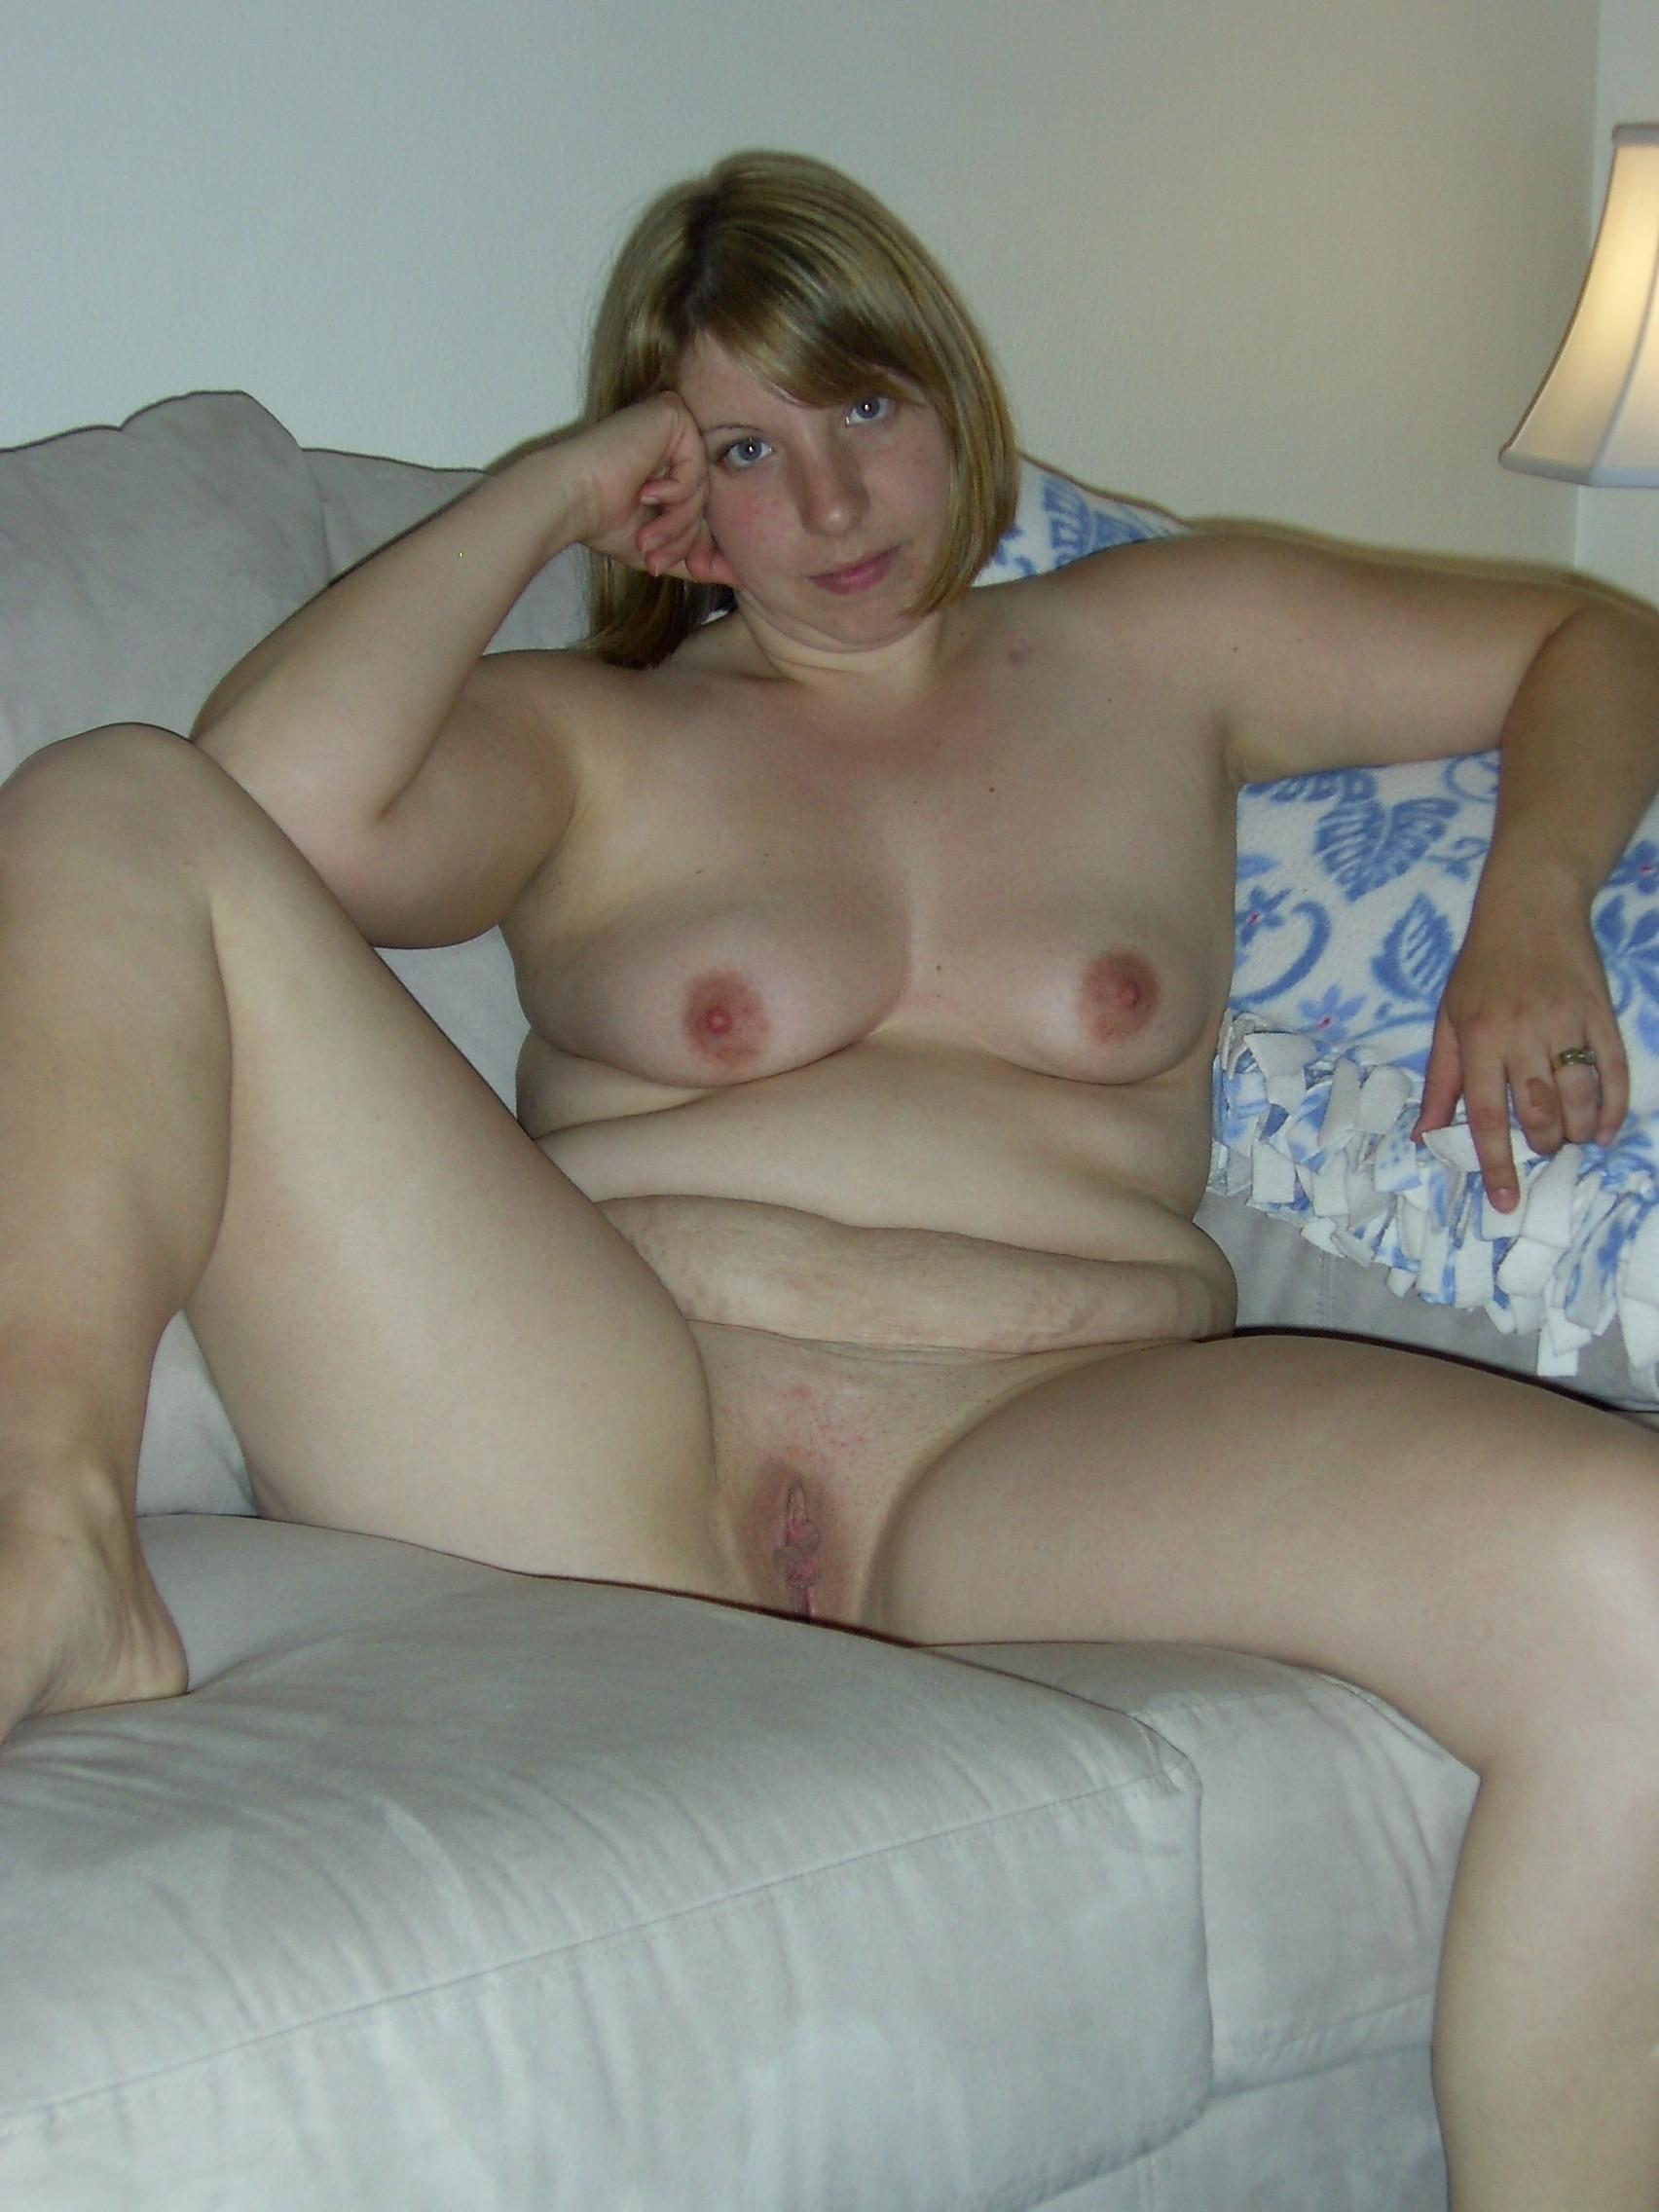 cutiepie mariza naked